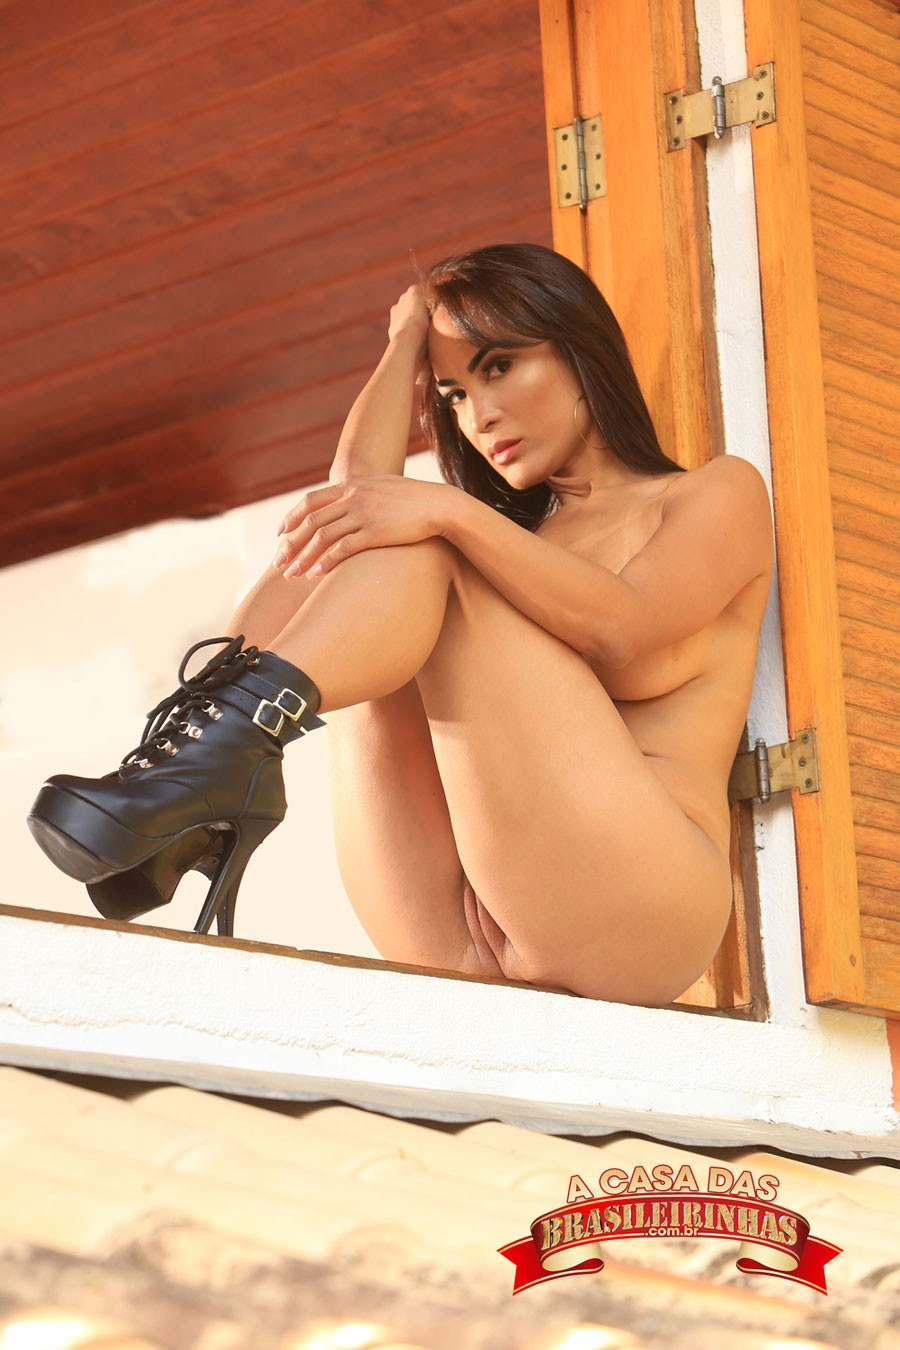 veterana-do-porno-Belinha-Baracho.jpg